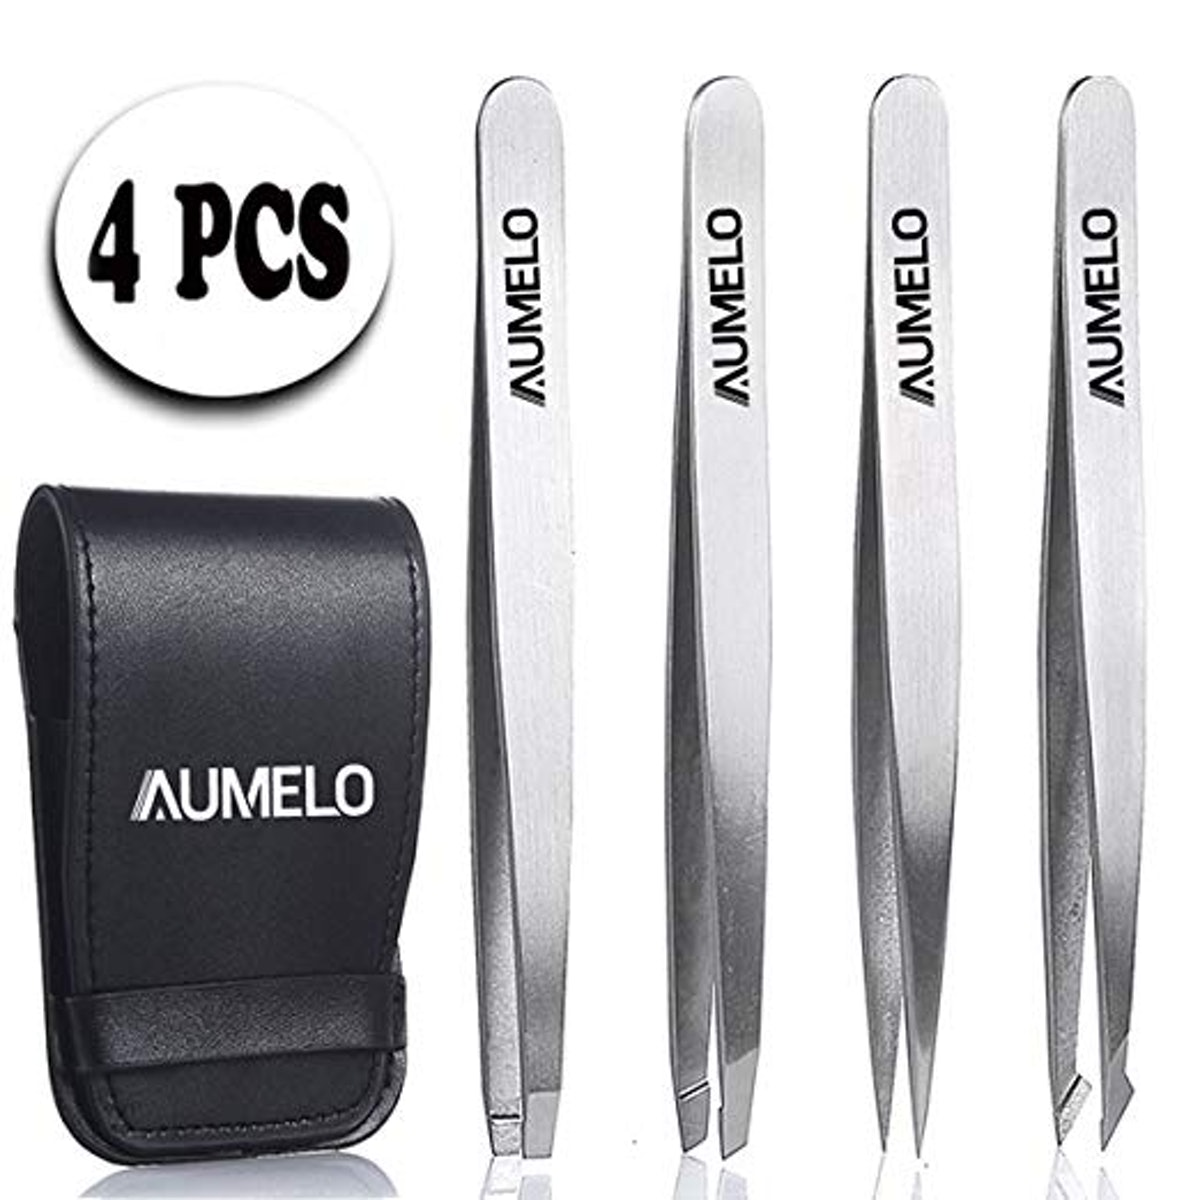 Aumelo Tweezer (Set of 4)